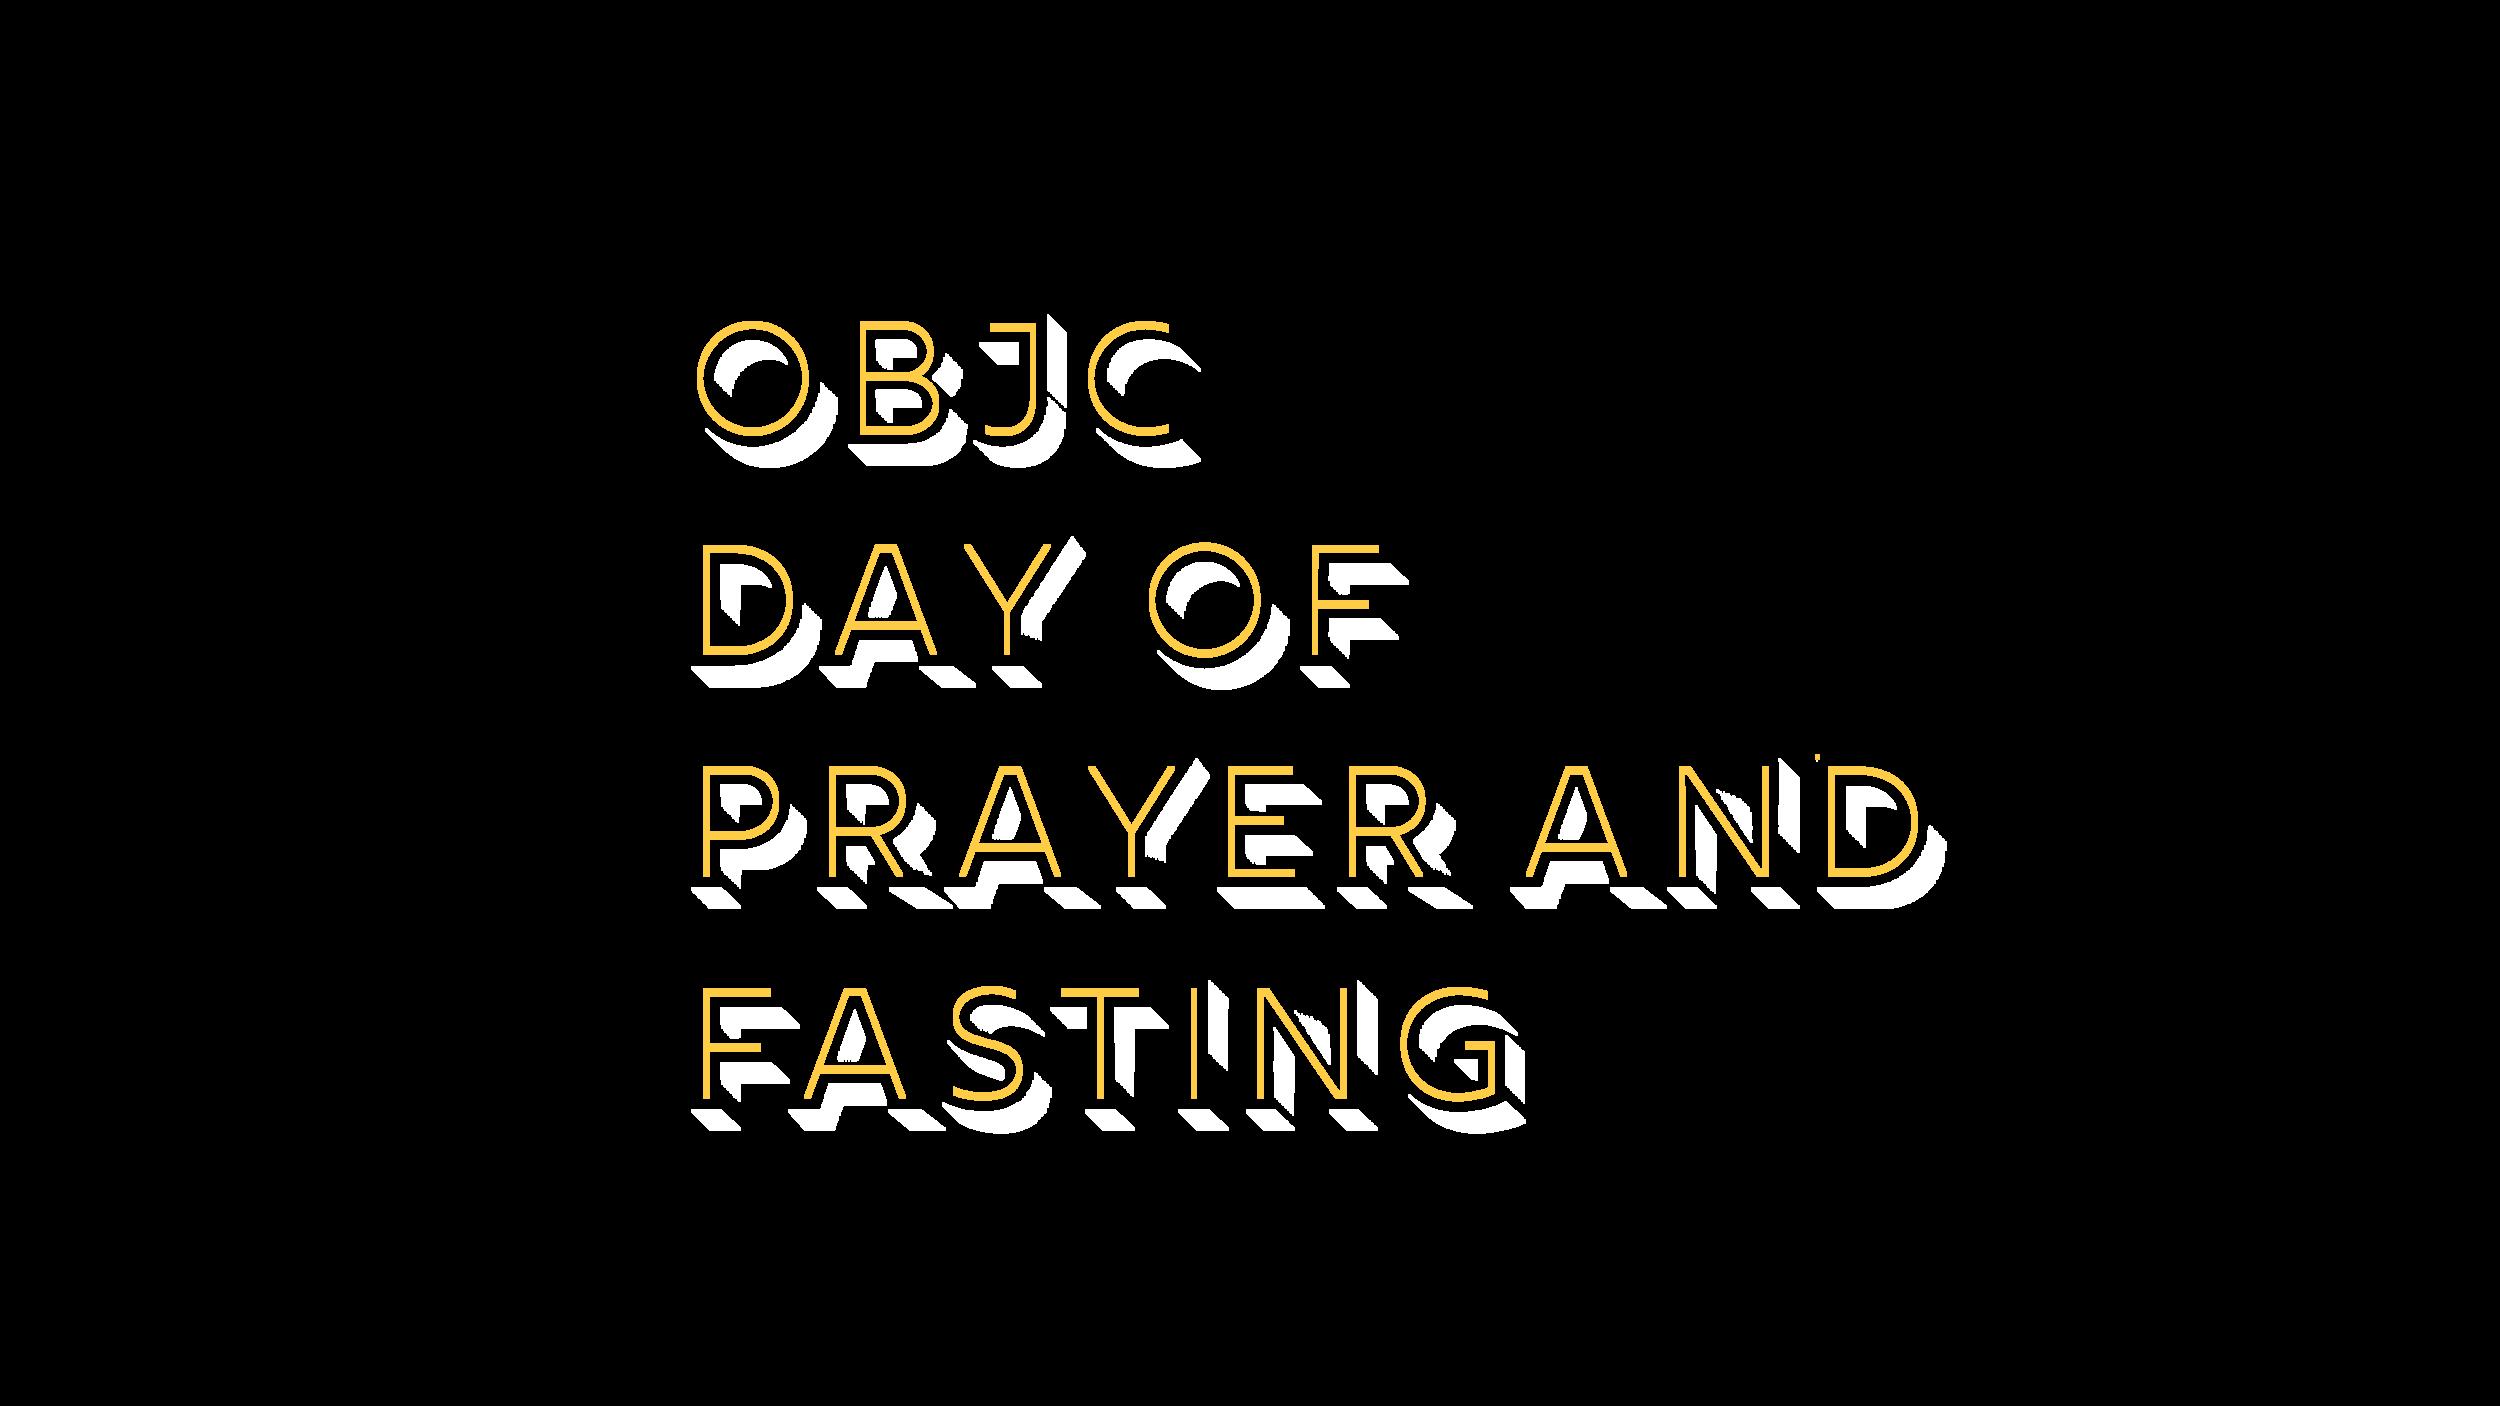 OBJC_FastingandPrayer_WebText.png